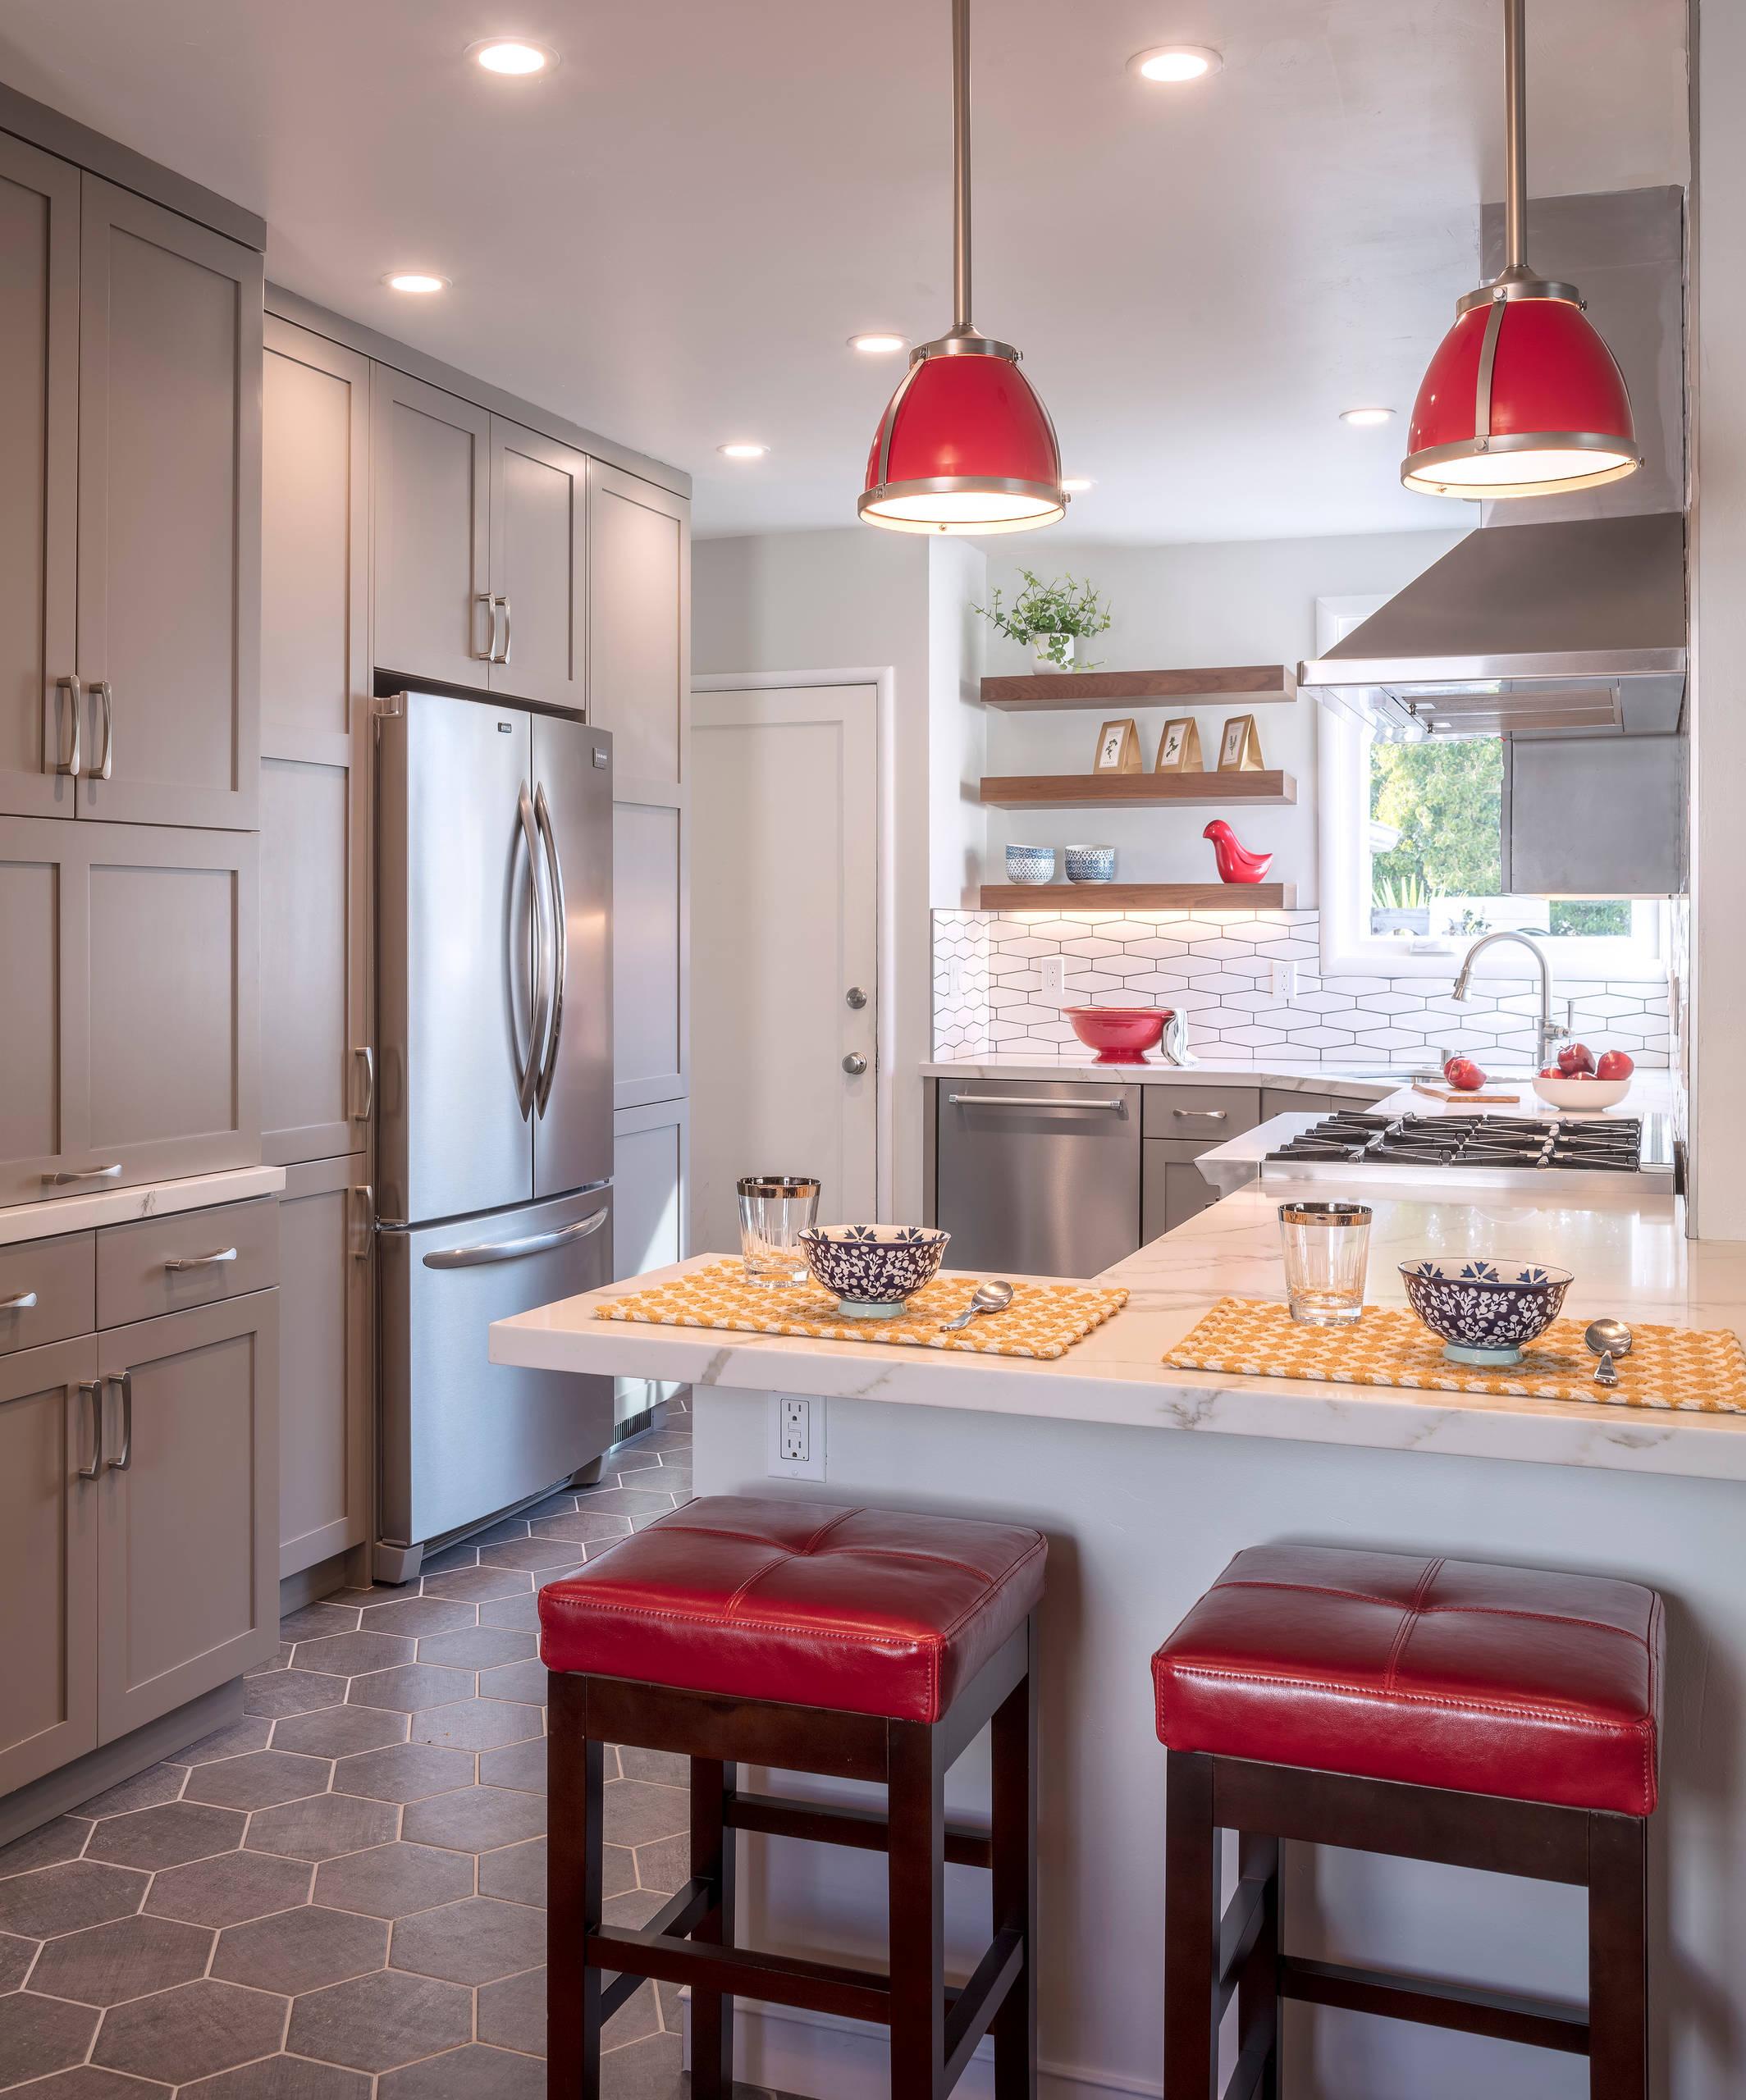 Backsplash With Red Accent Tile Kitchen Ideas Photos Houzz